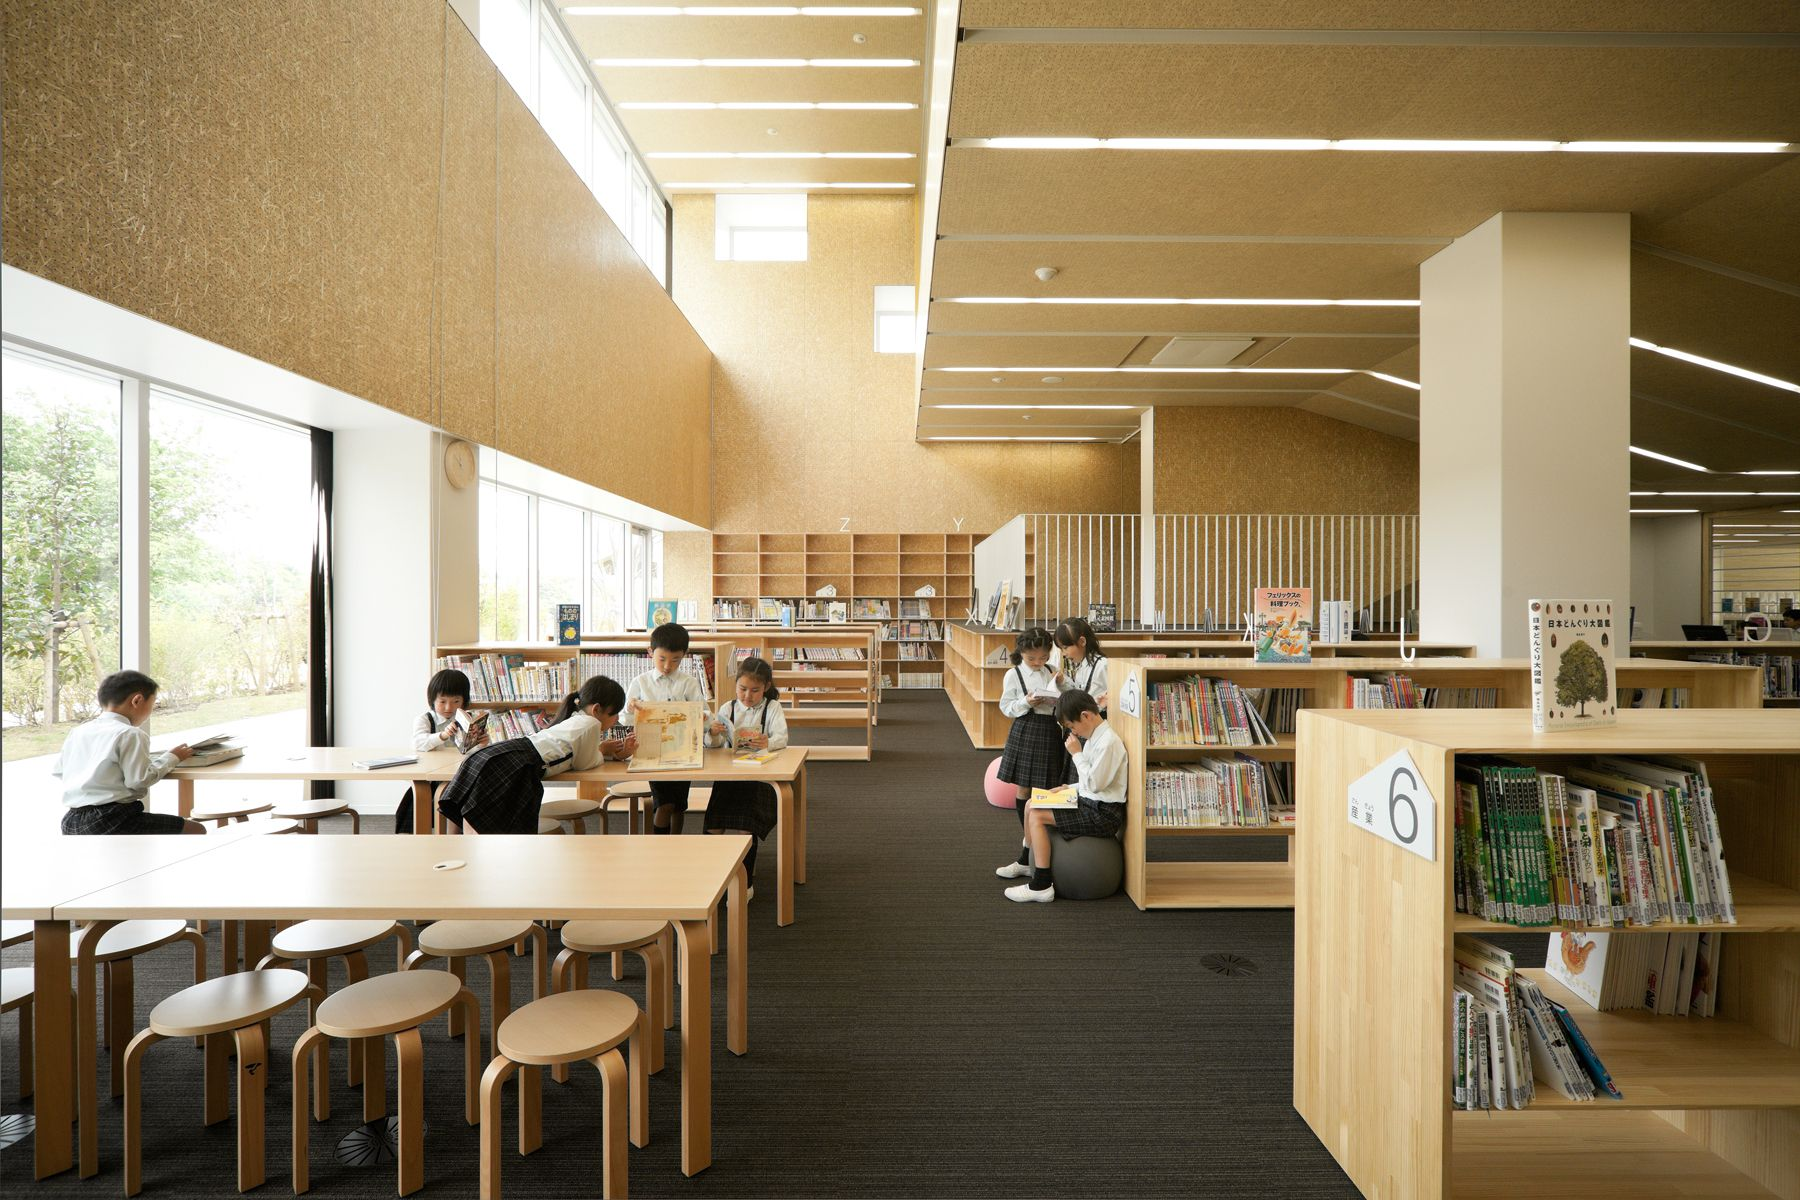 Teikyo University Elementary School U2014 帝京大学小学校 | Architecture